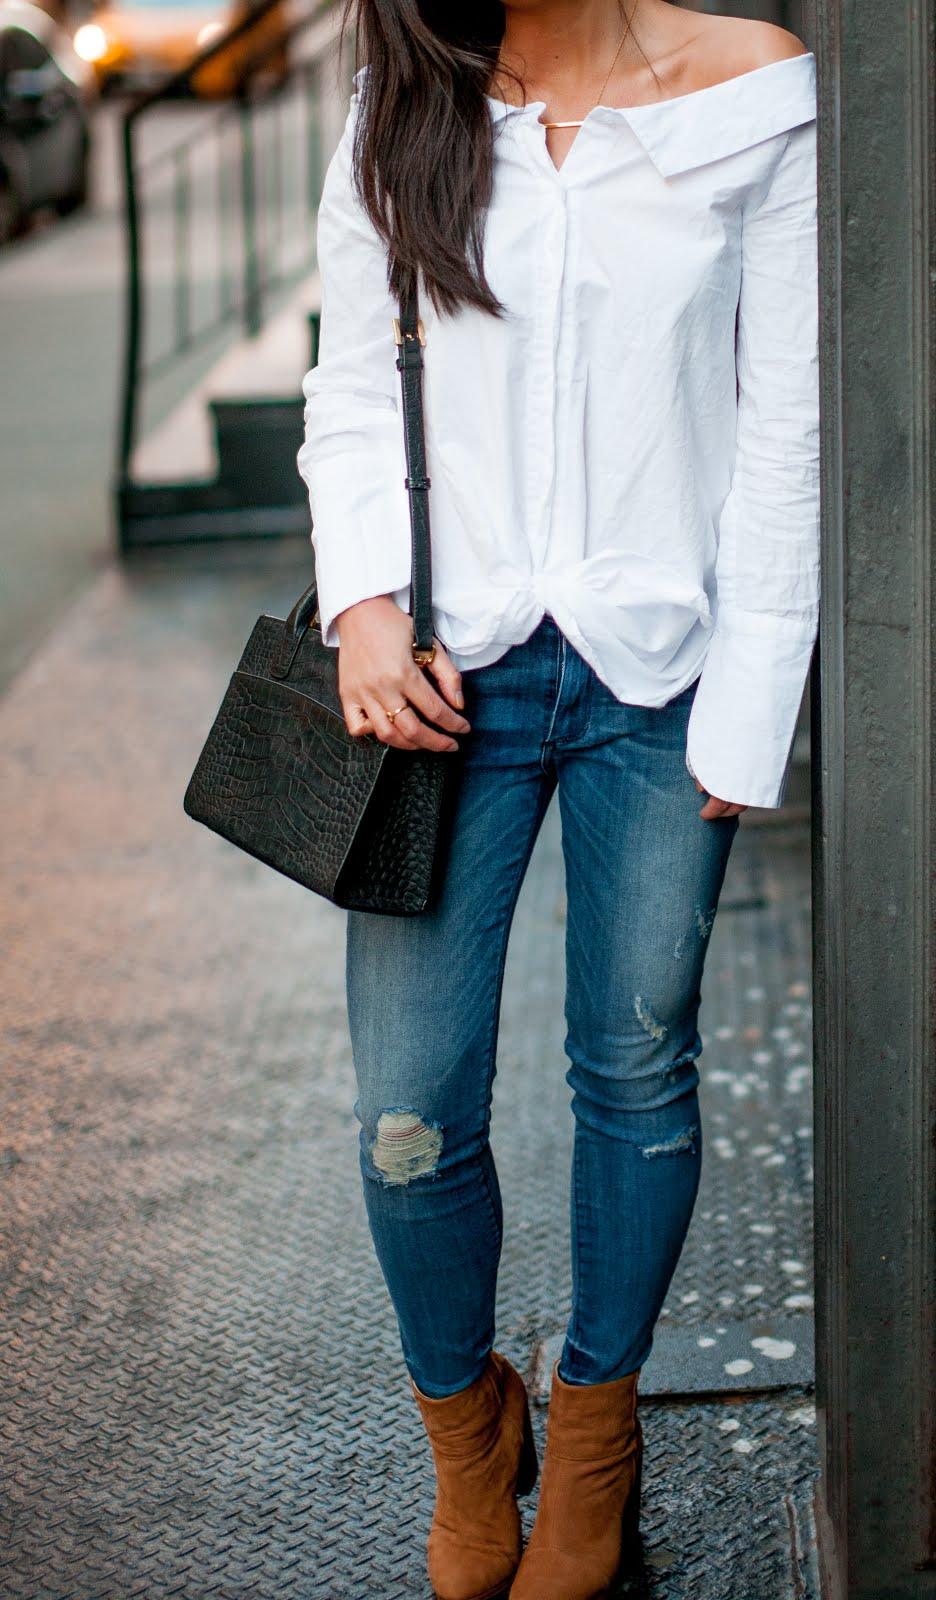 off the shoulder shirt snapshots of my closet fashion blogger